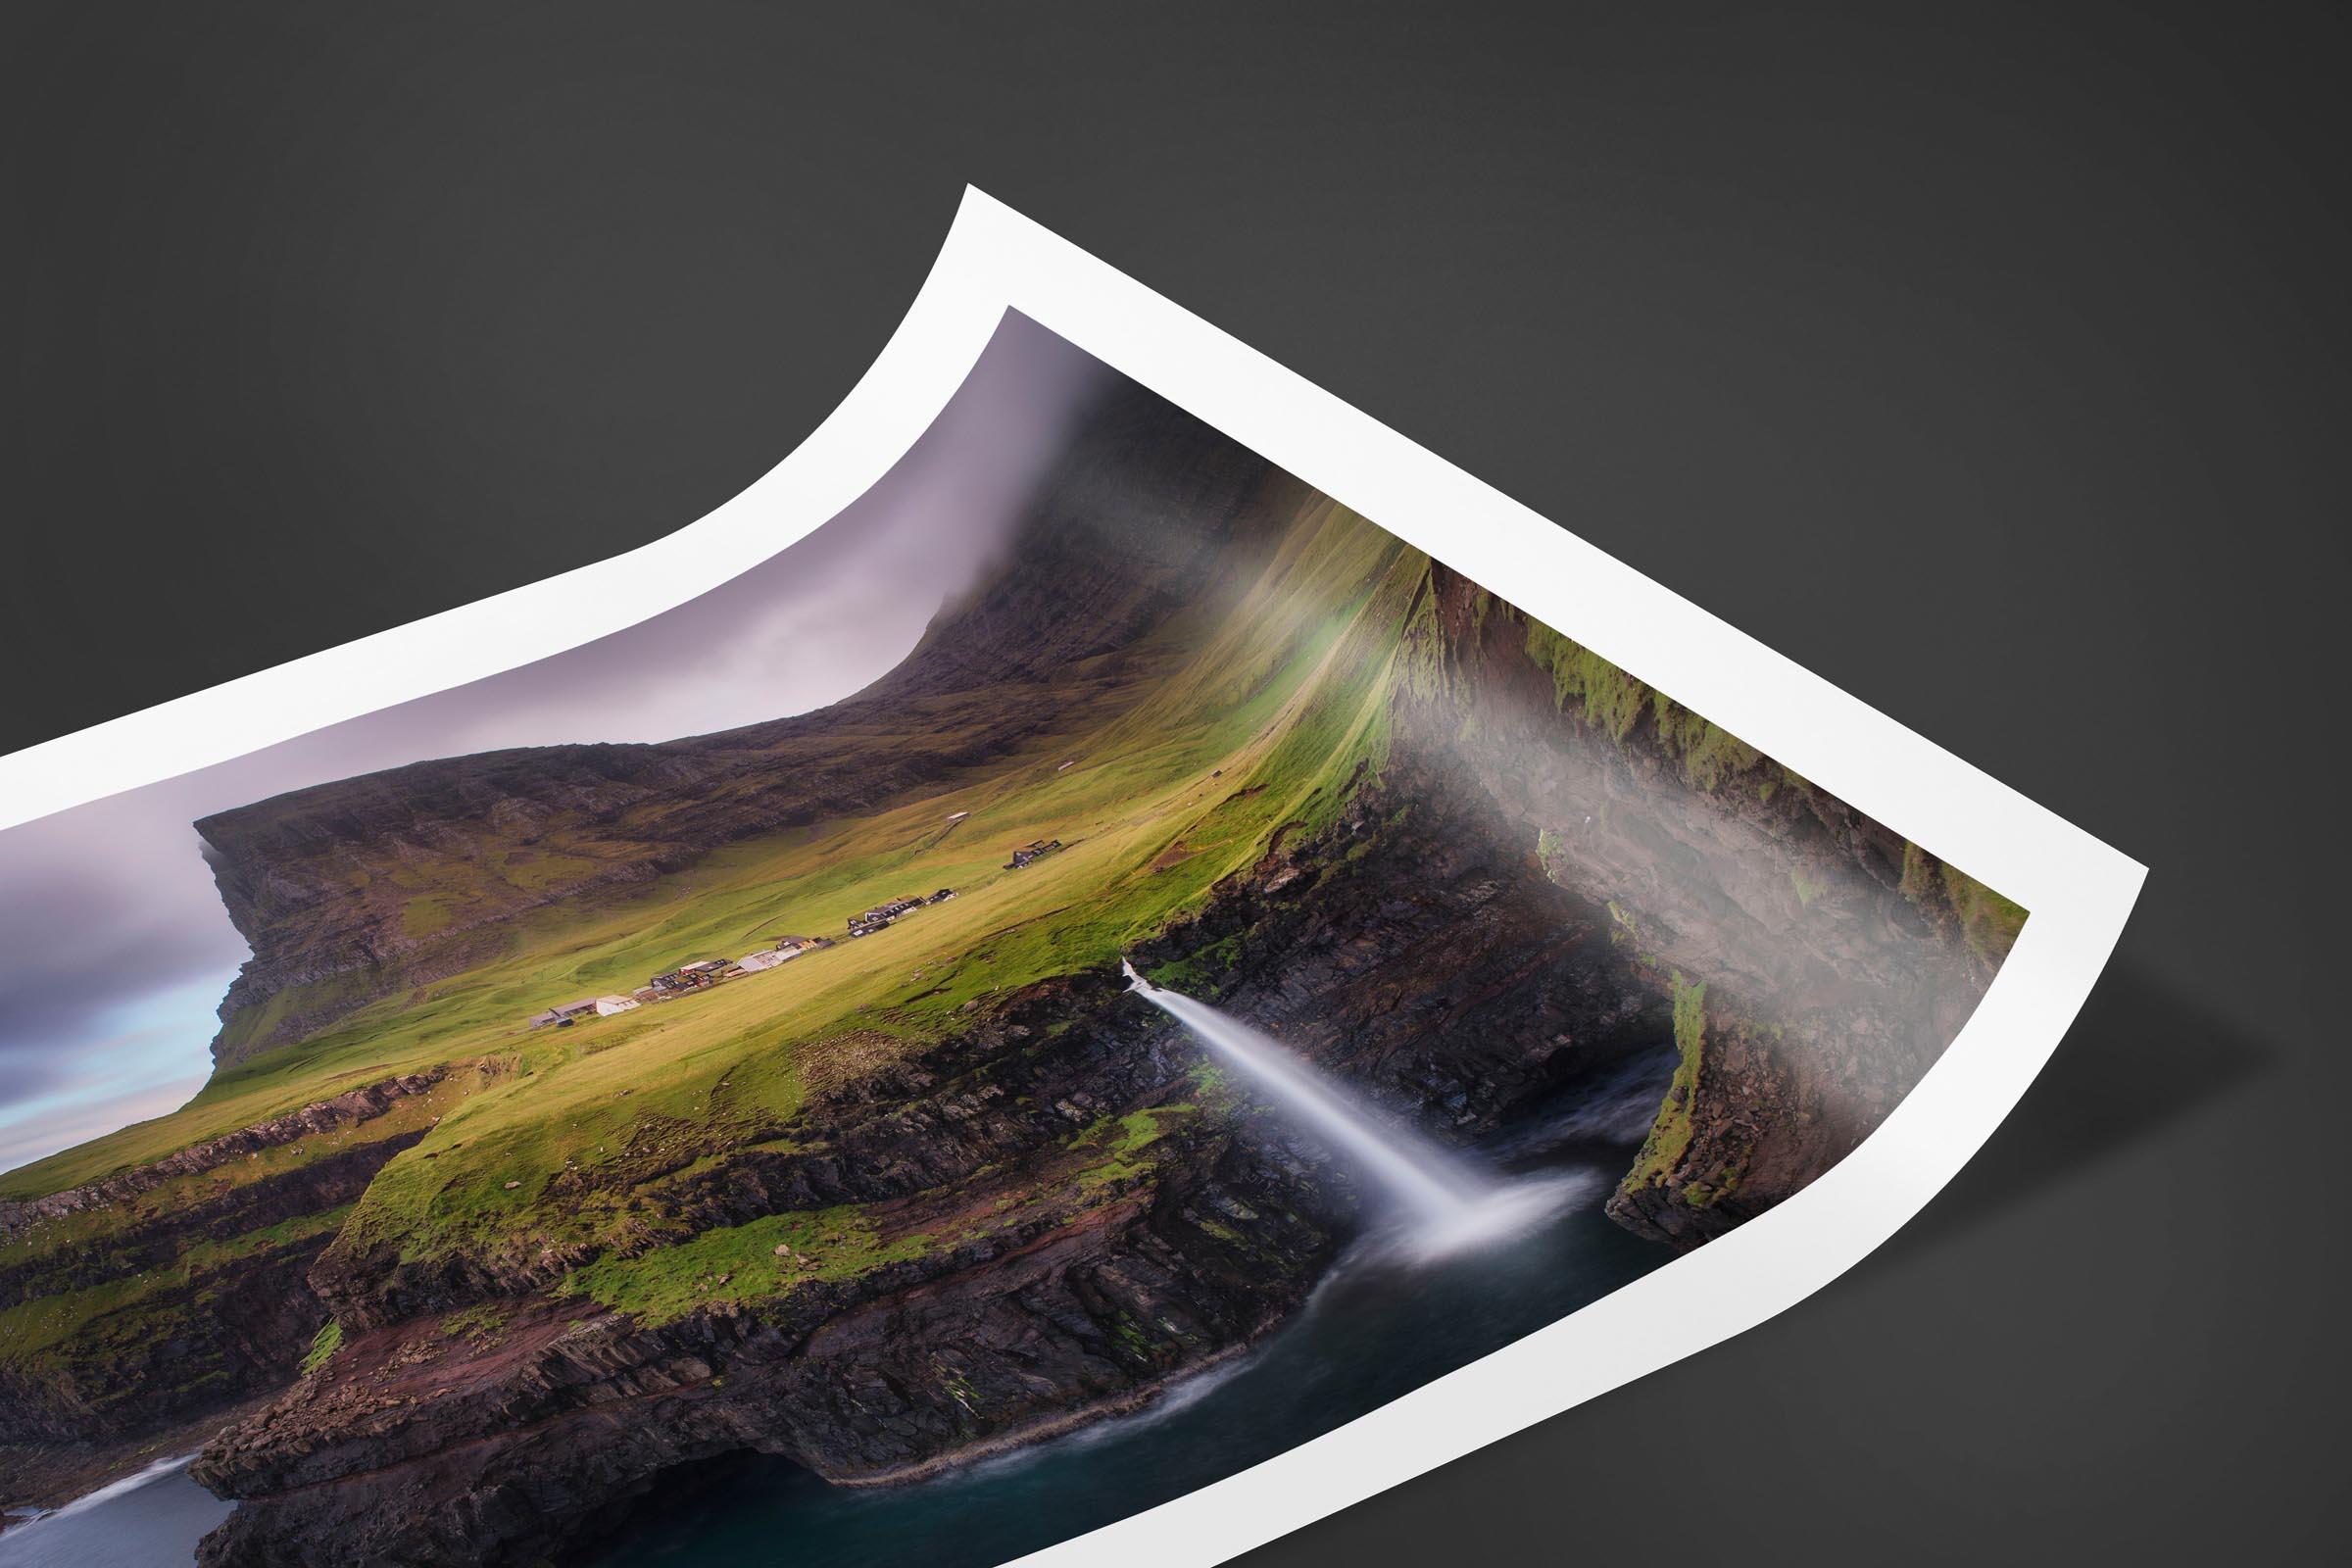 Fine art limited edition print of Mulafossur Waterfall in Gasadalur, Faroe Islands by Brent Goldman Photography